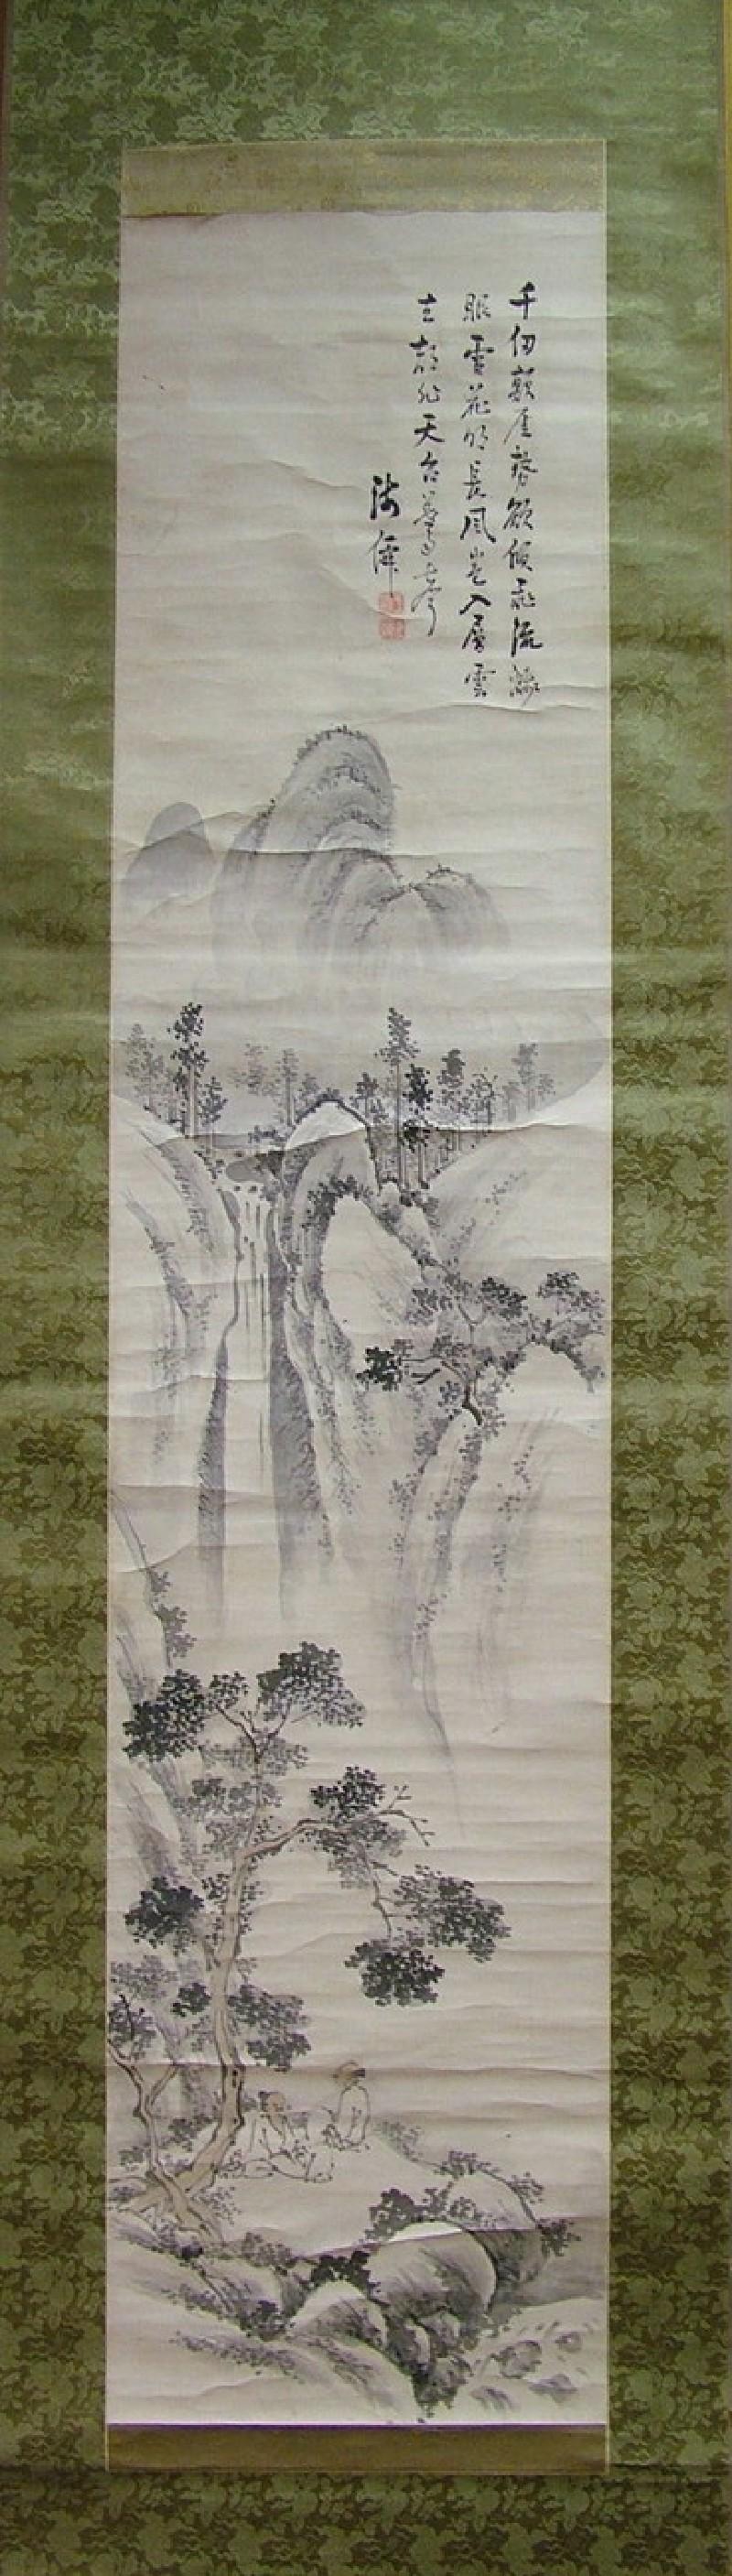 Scholars viewing a waterfall (EA1964.92, record shot)